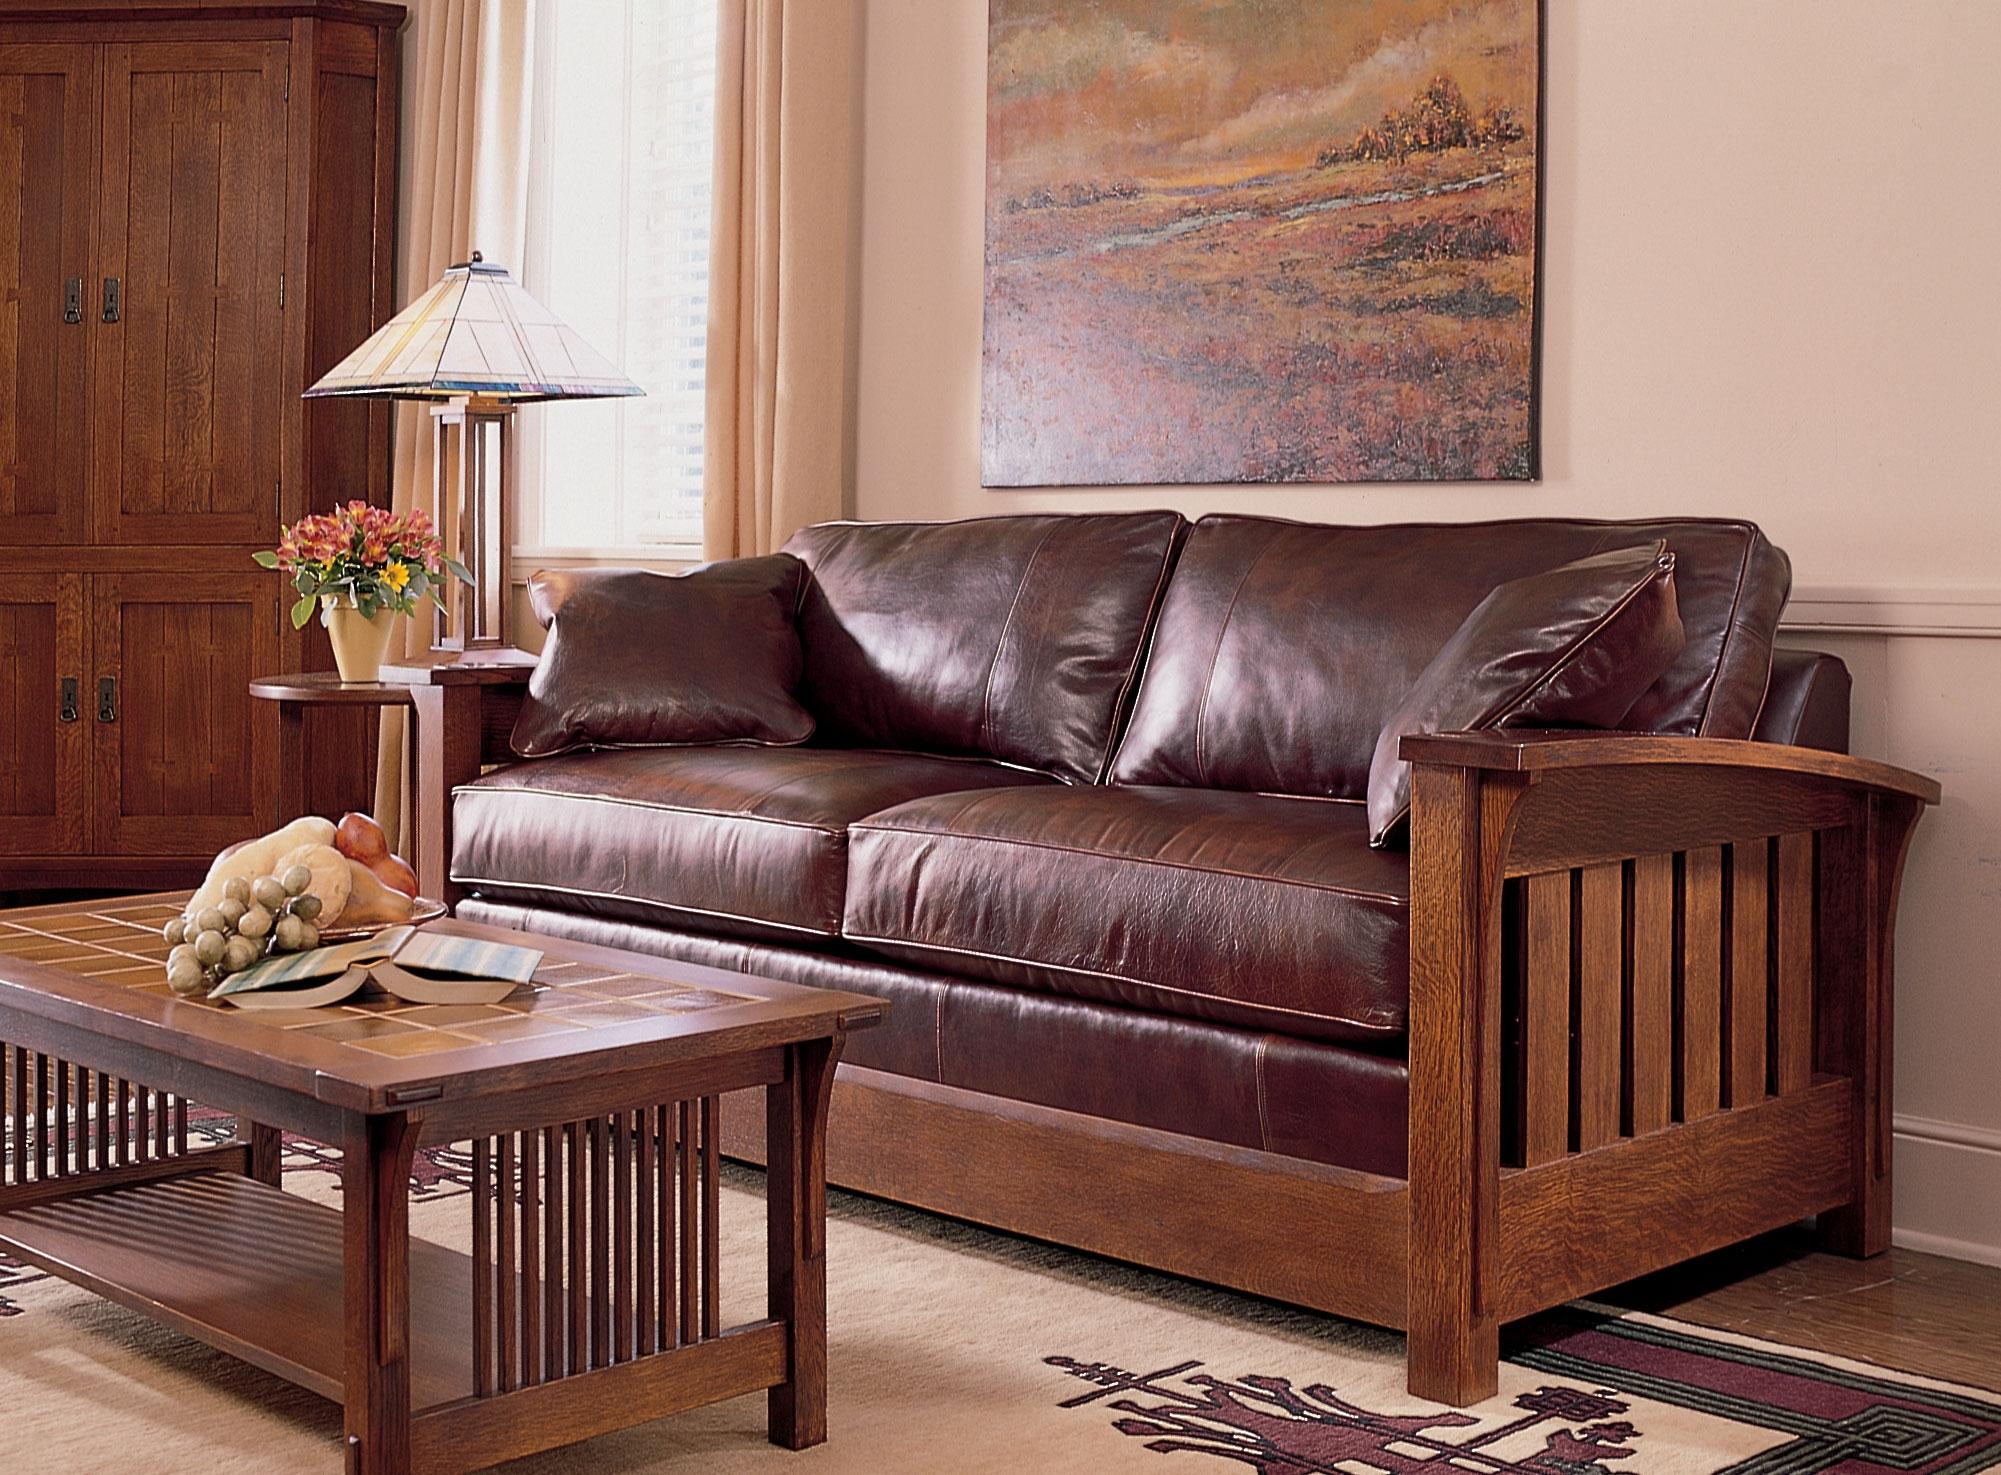 Living Room Furniture San Francisco Avetex Furniture Inc 2015 | Home ...